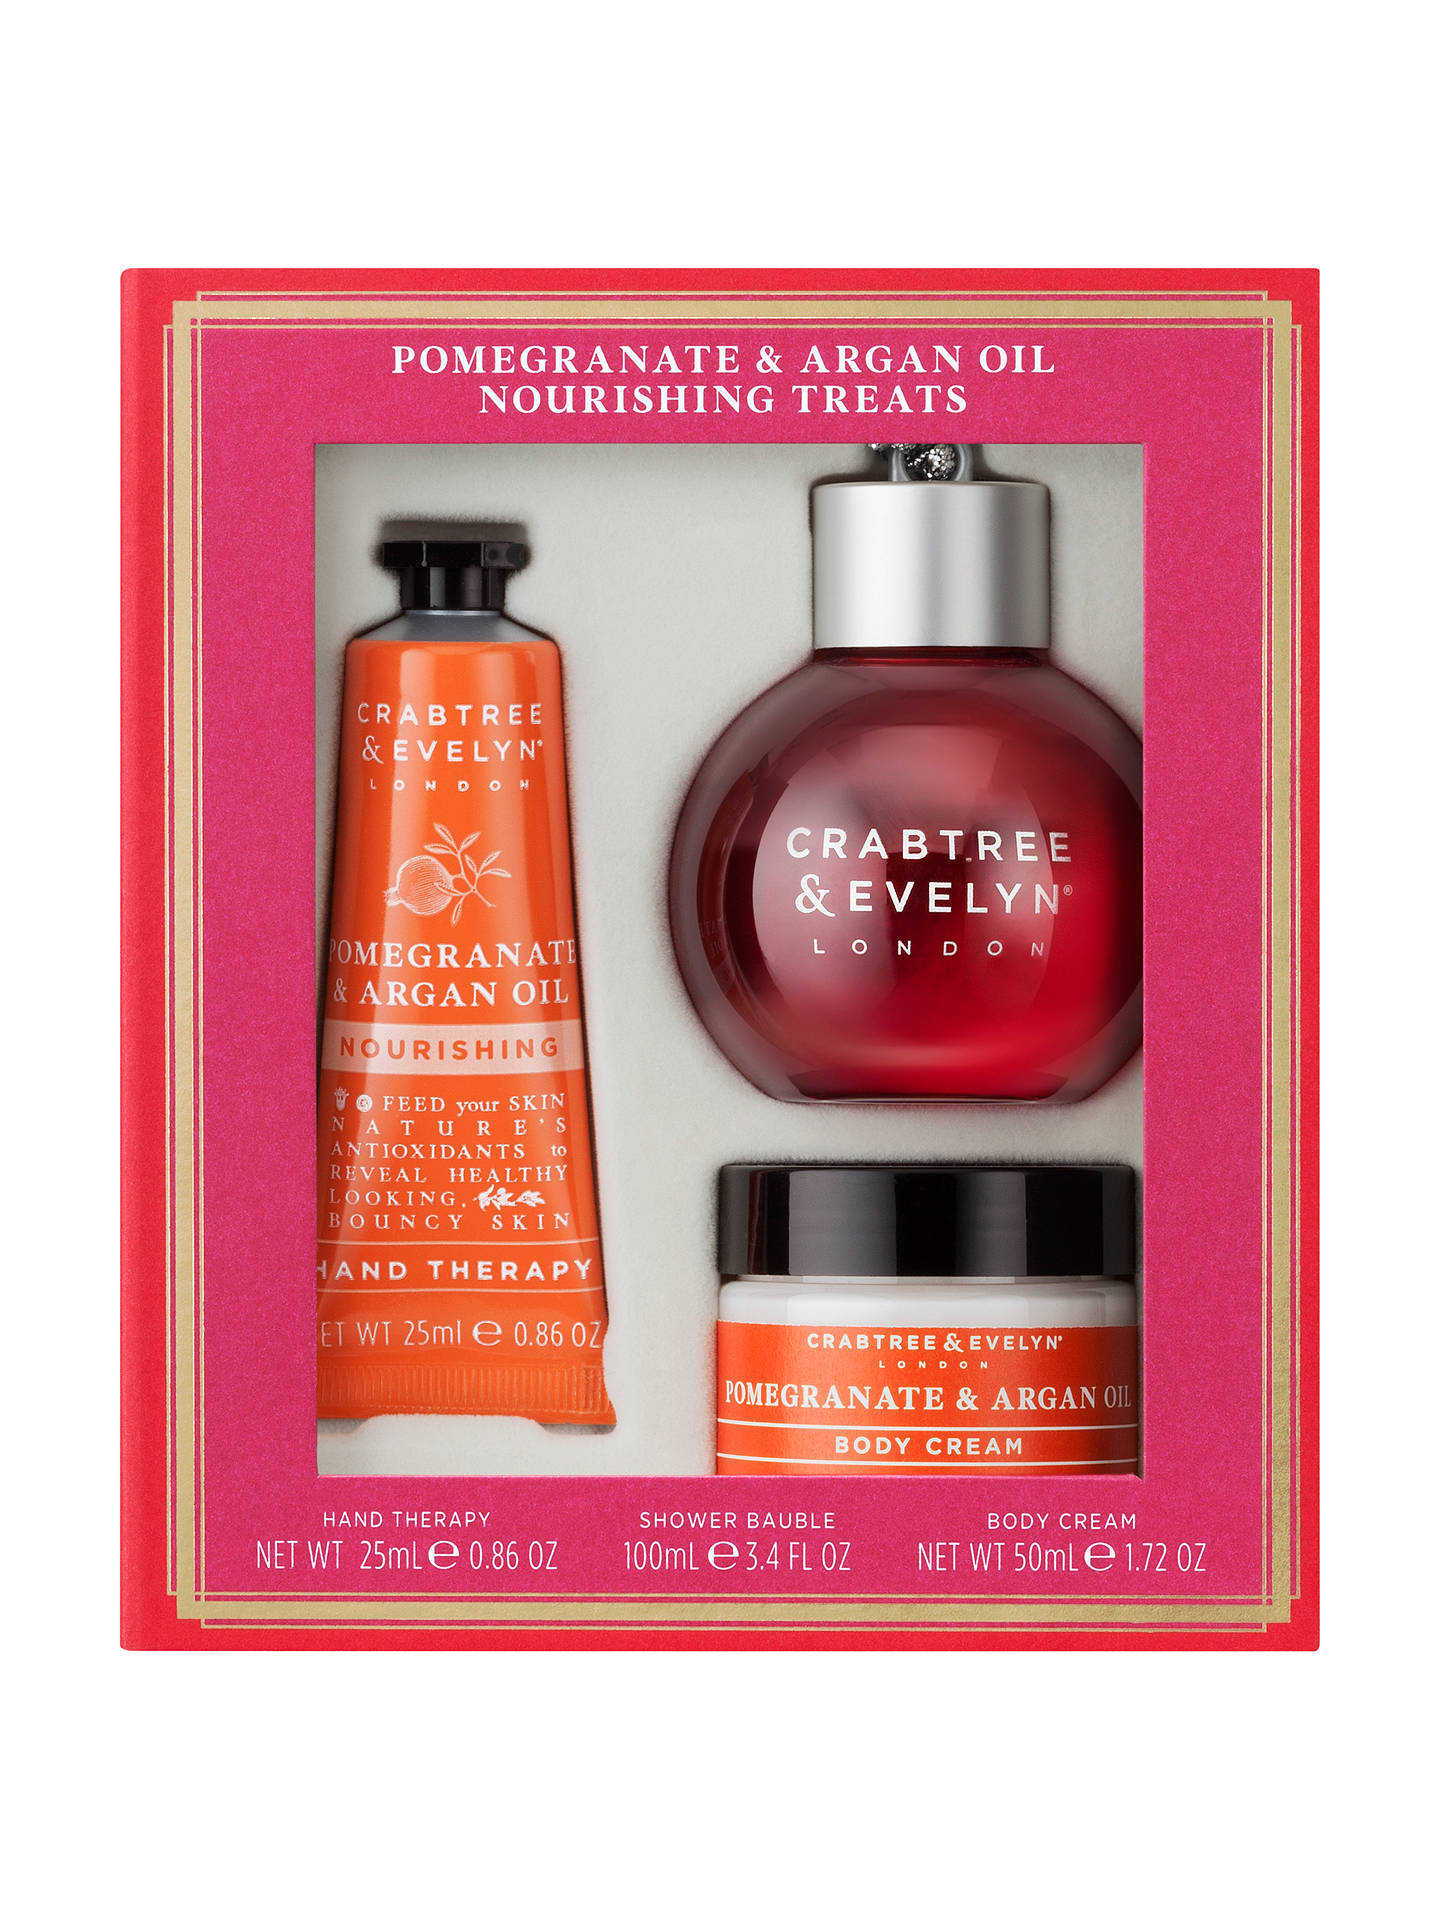 Crabtree & Evelyn Pomegranate & Argan Oil Nourishing Treats Gift Set